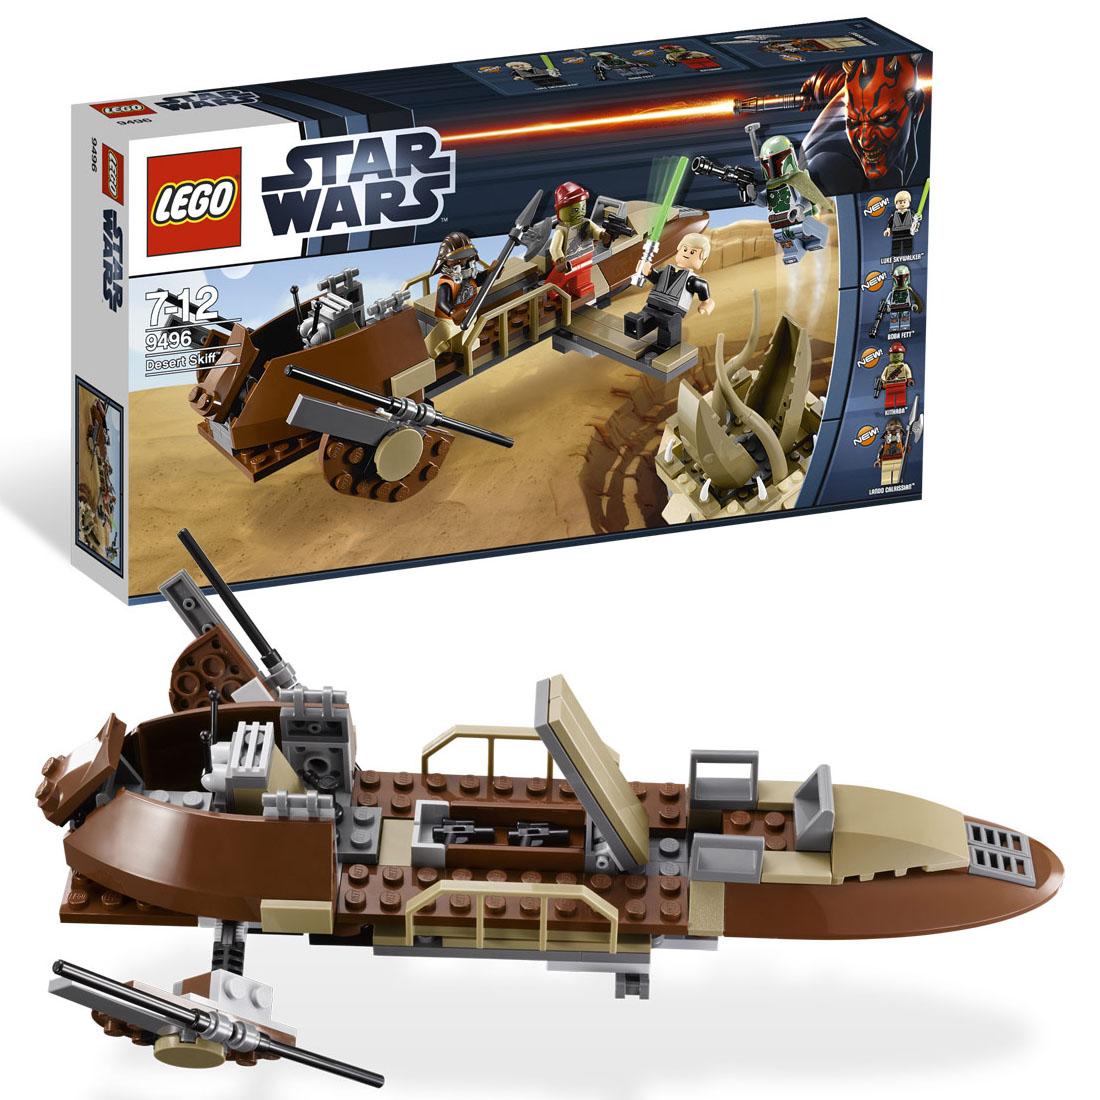 LEGO Star Wars Desert Skiff